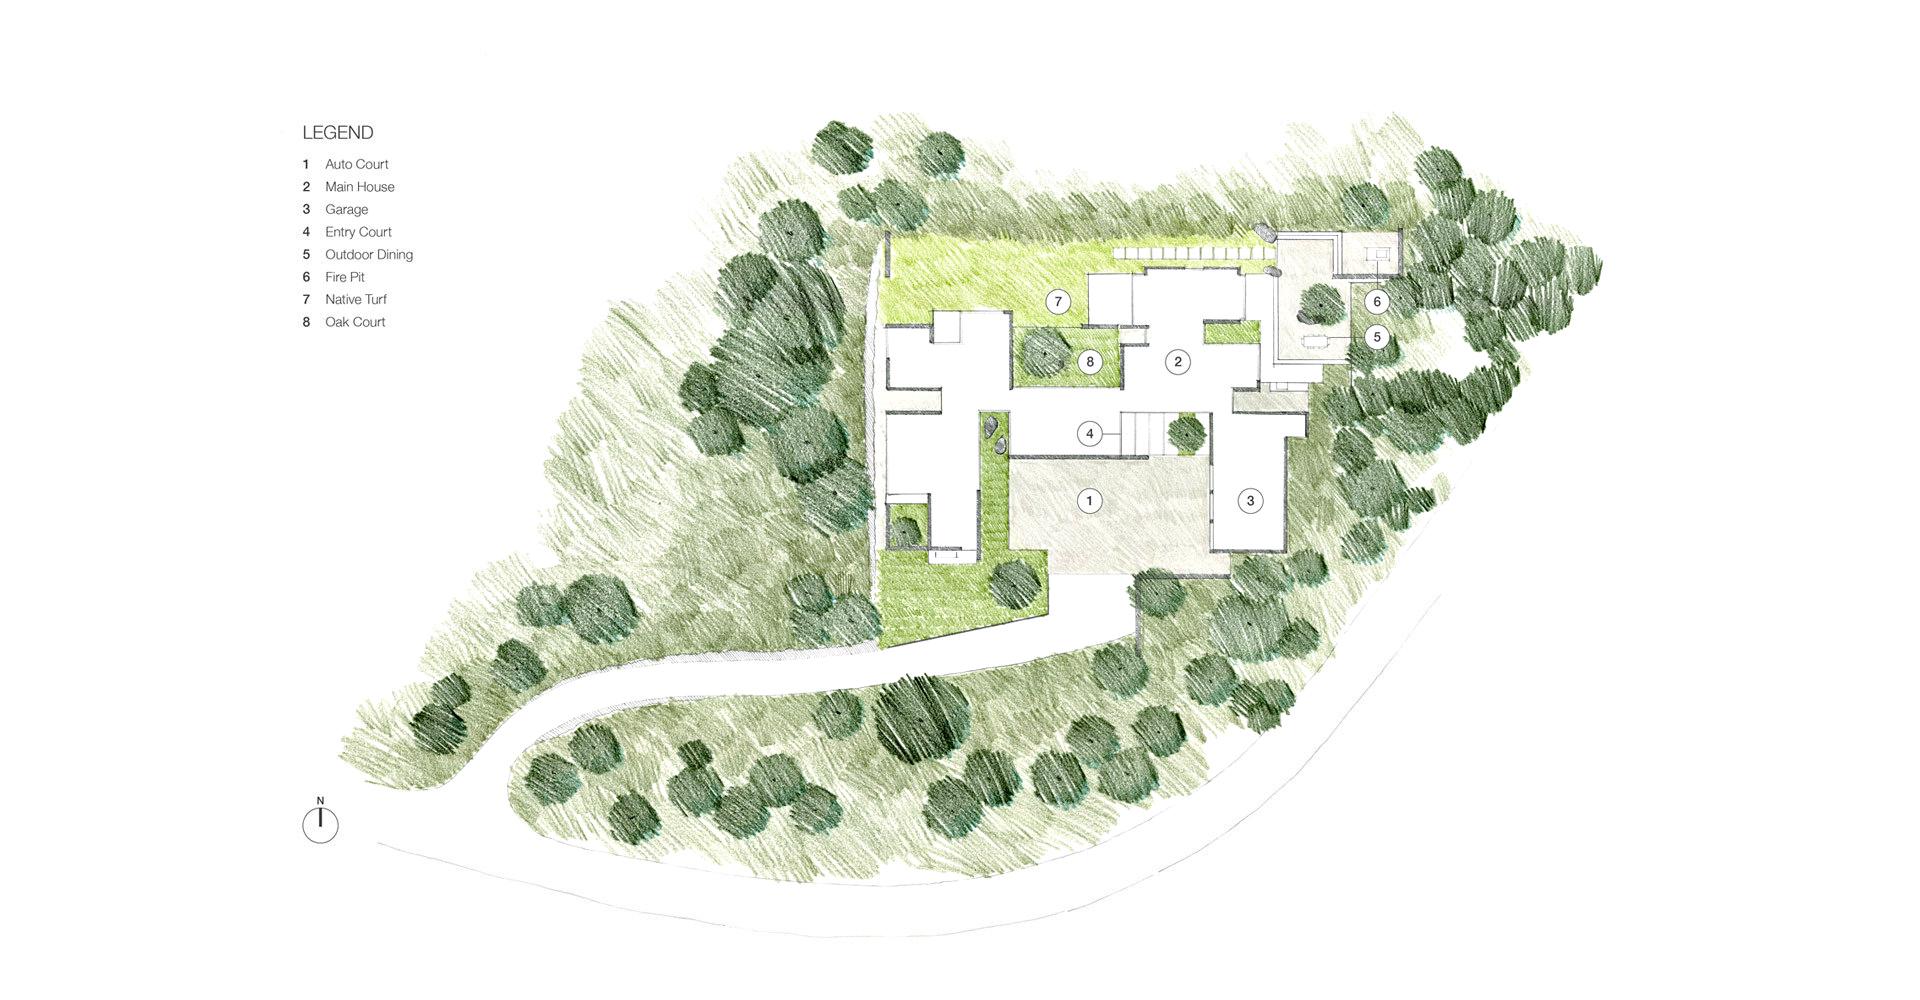 Site Plan - Carmel Ridge Residence - Santa Lucia Preserve, Carmel, CA, USA